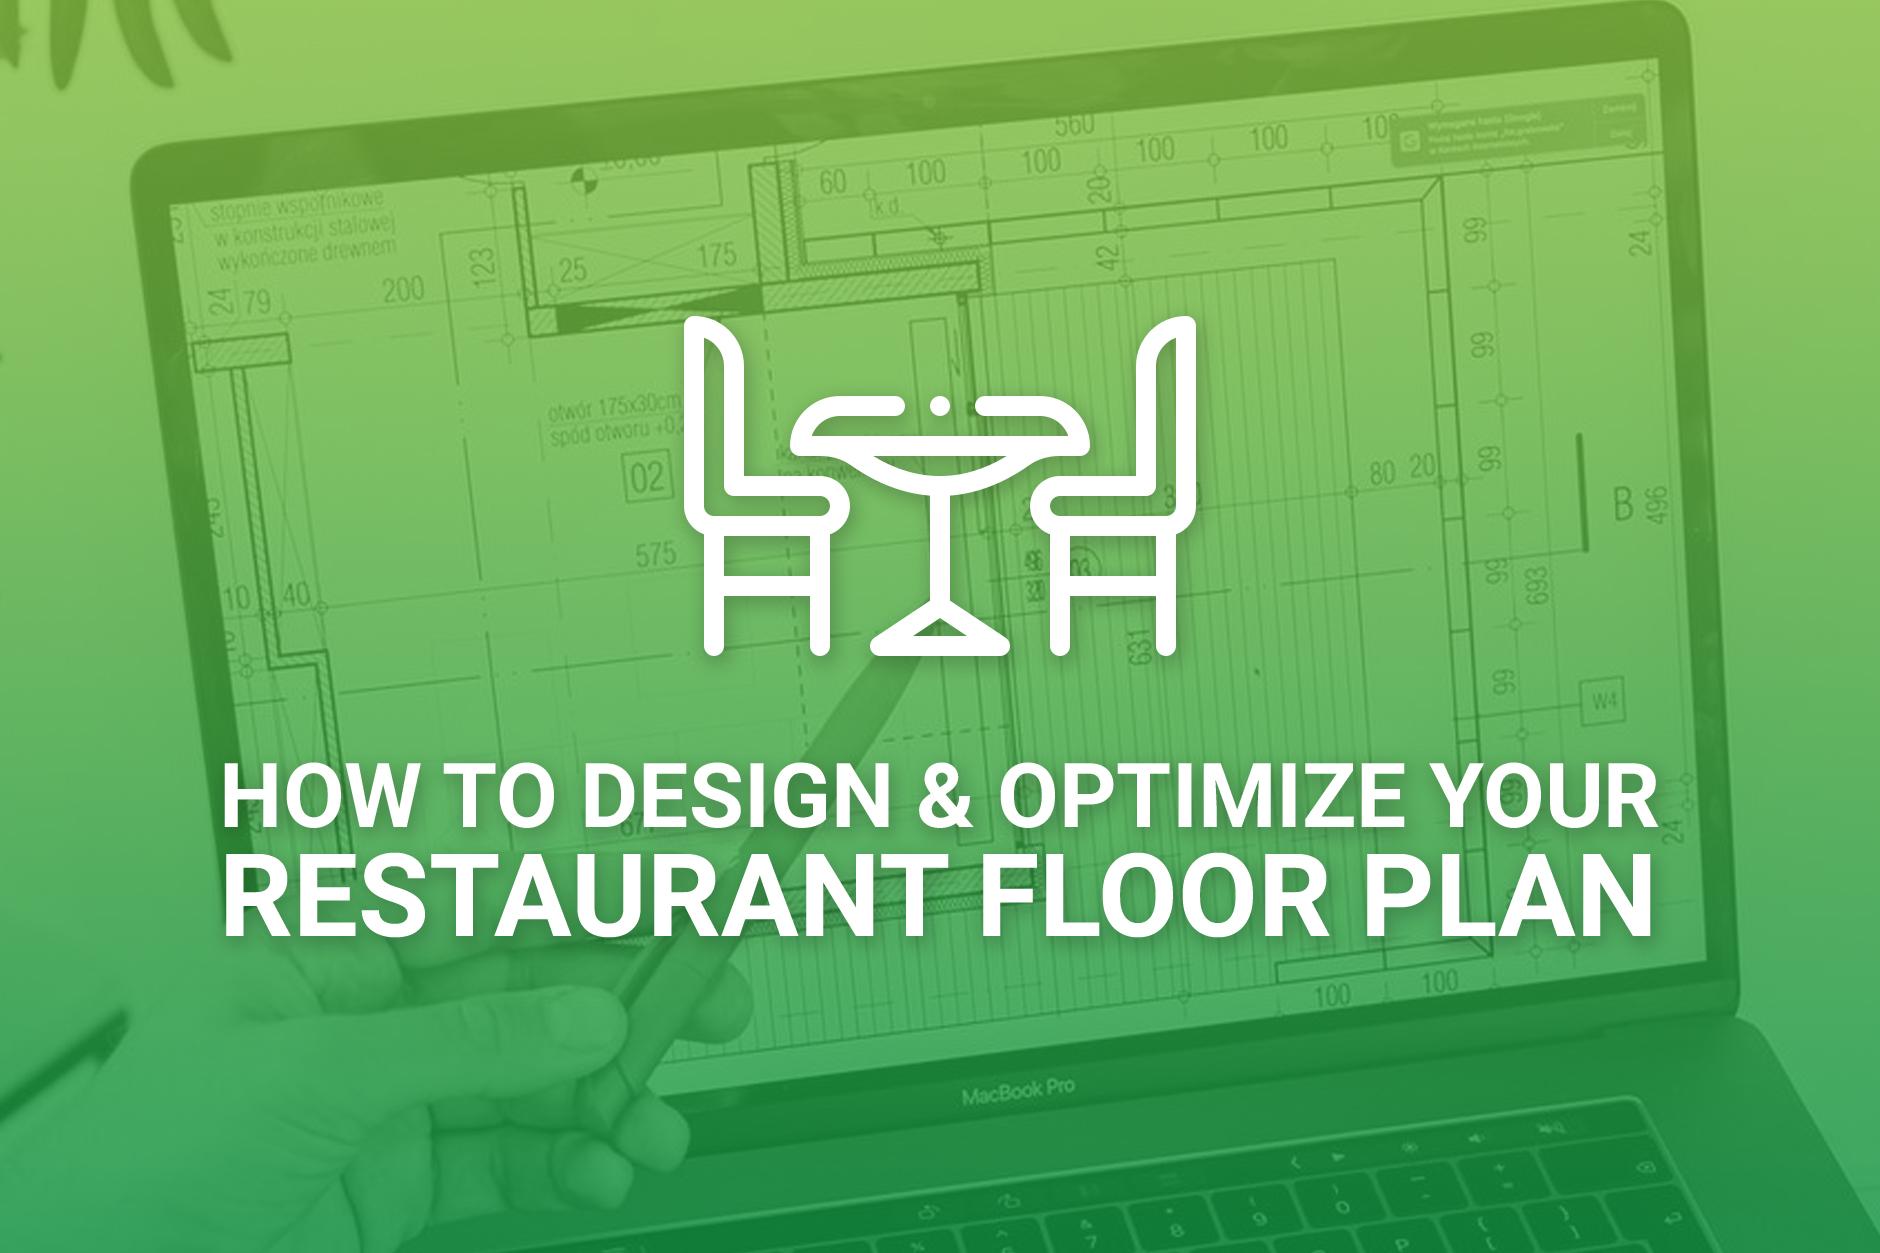 Design and Optimize Restaurant Floor Plans